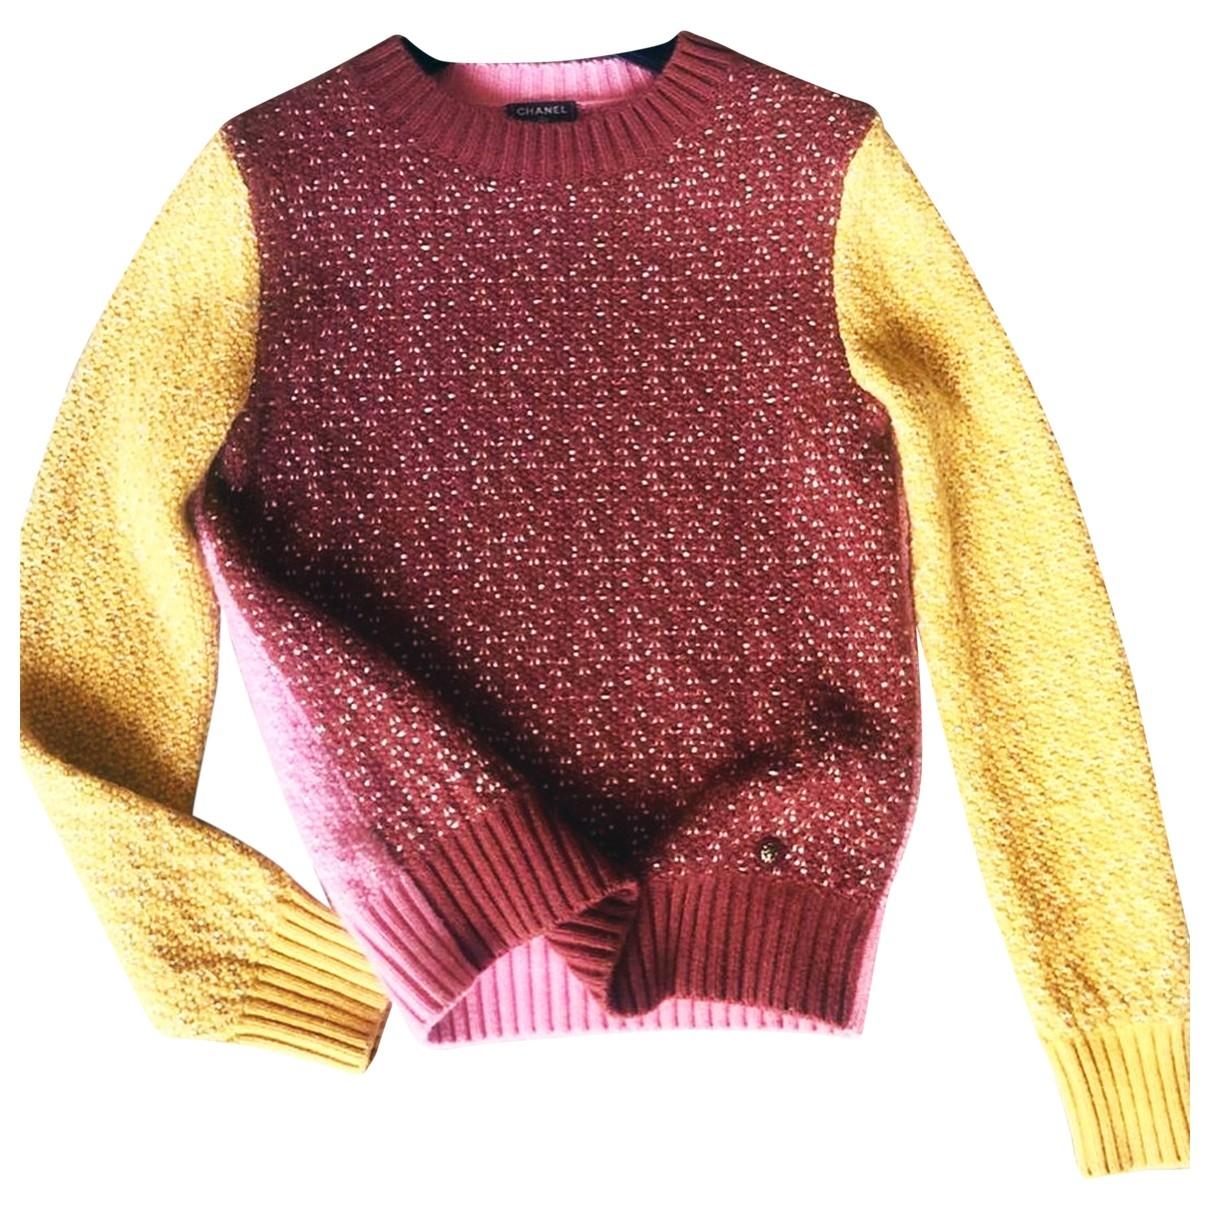 Chanel \N Pullover in  Bunt Kaschmir